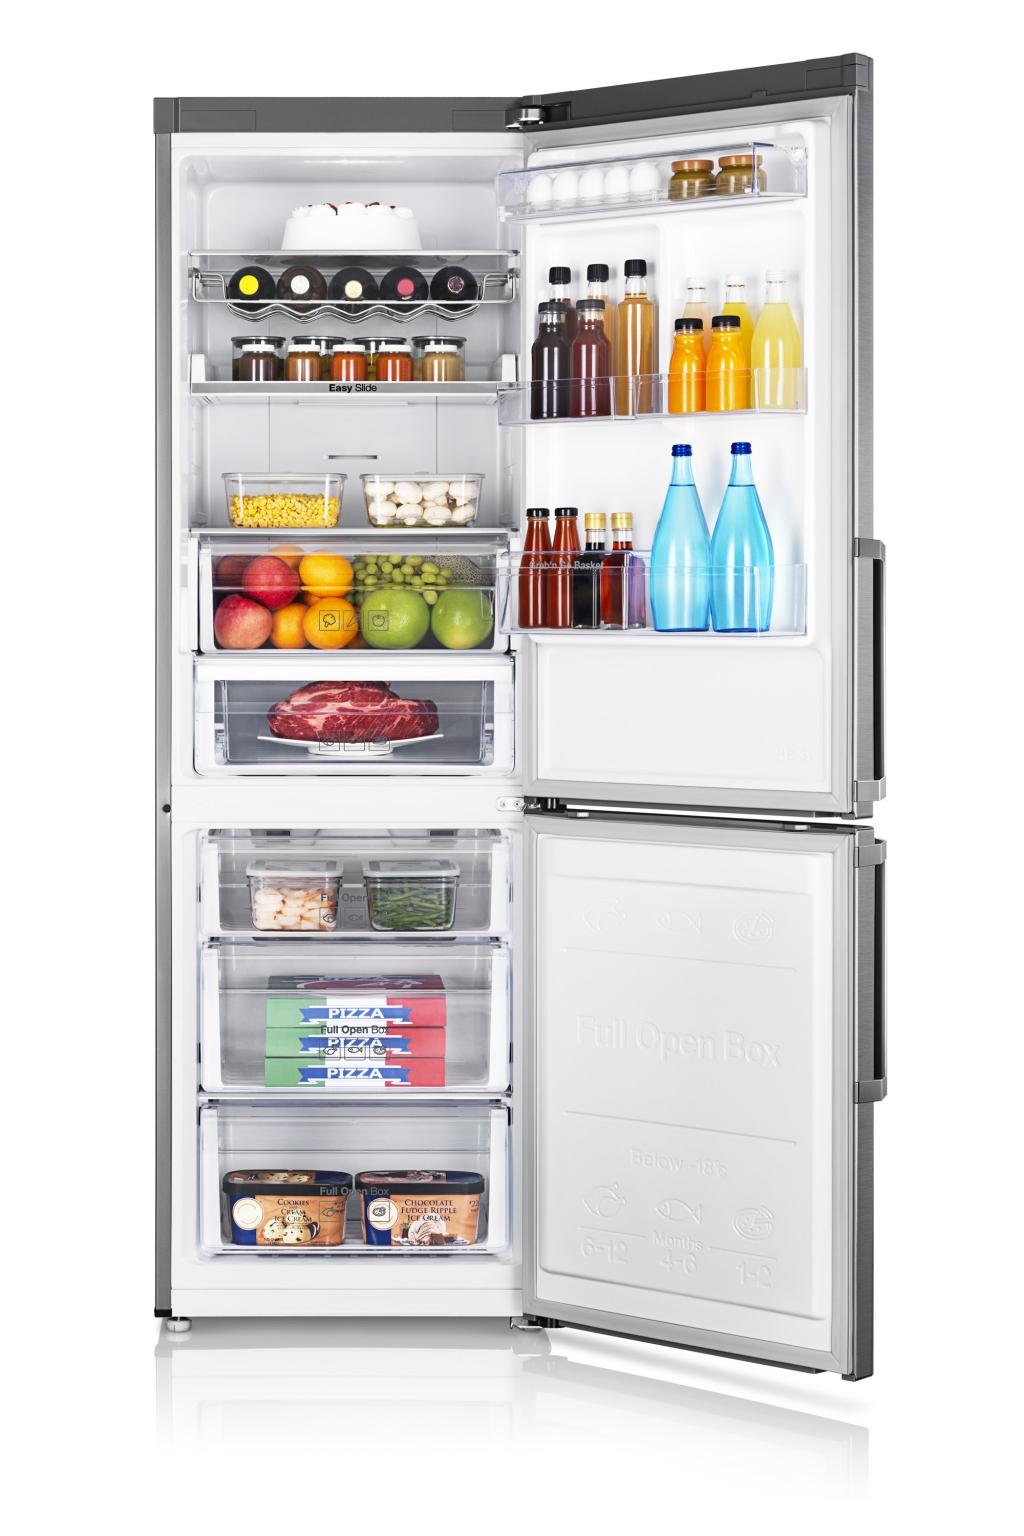 Samsung Refrigerators Won Five Crowns from European Consumer Magazines